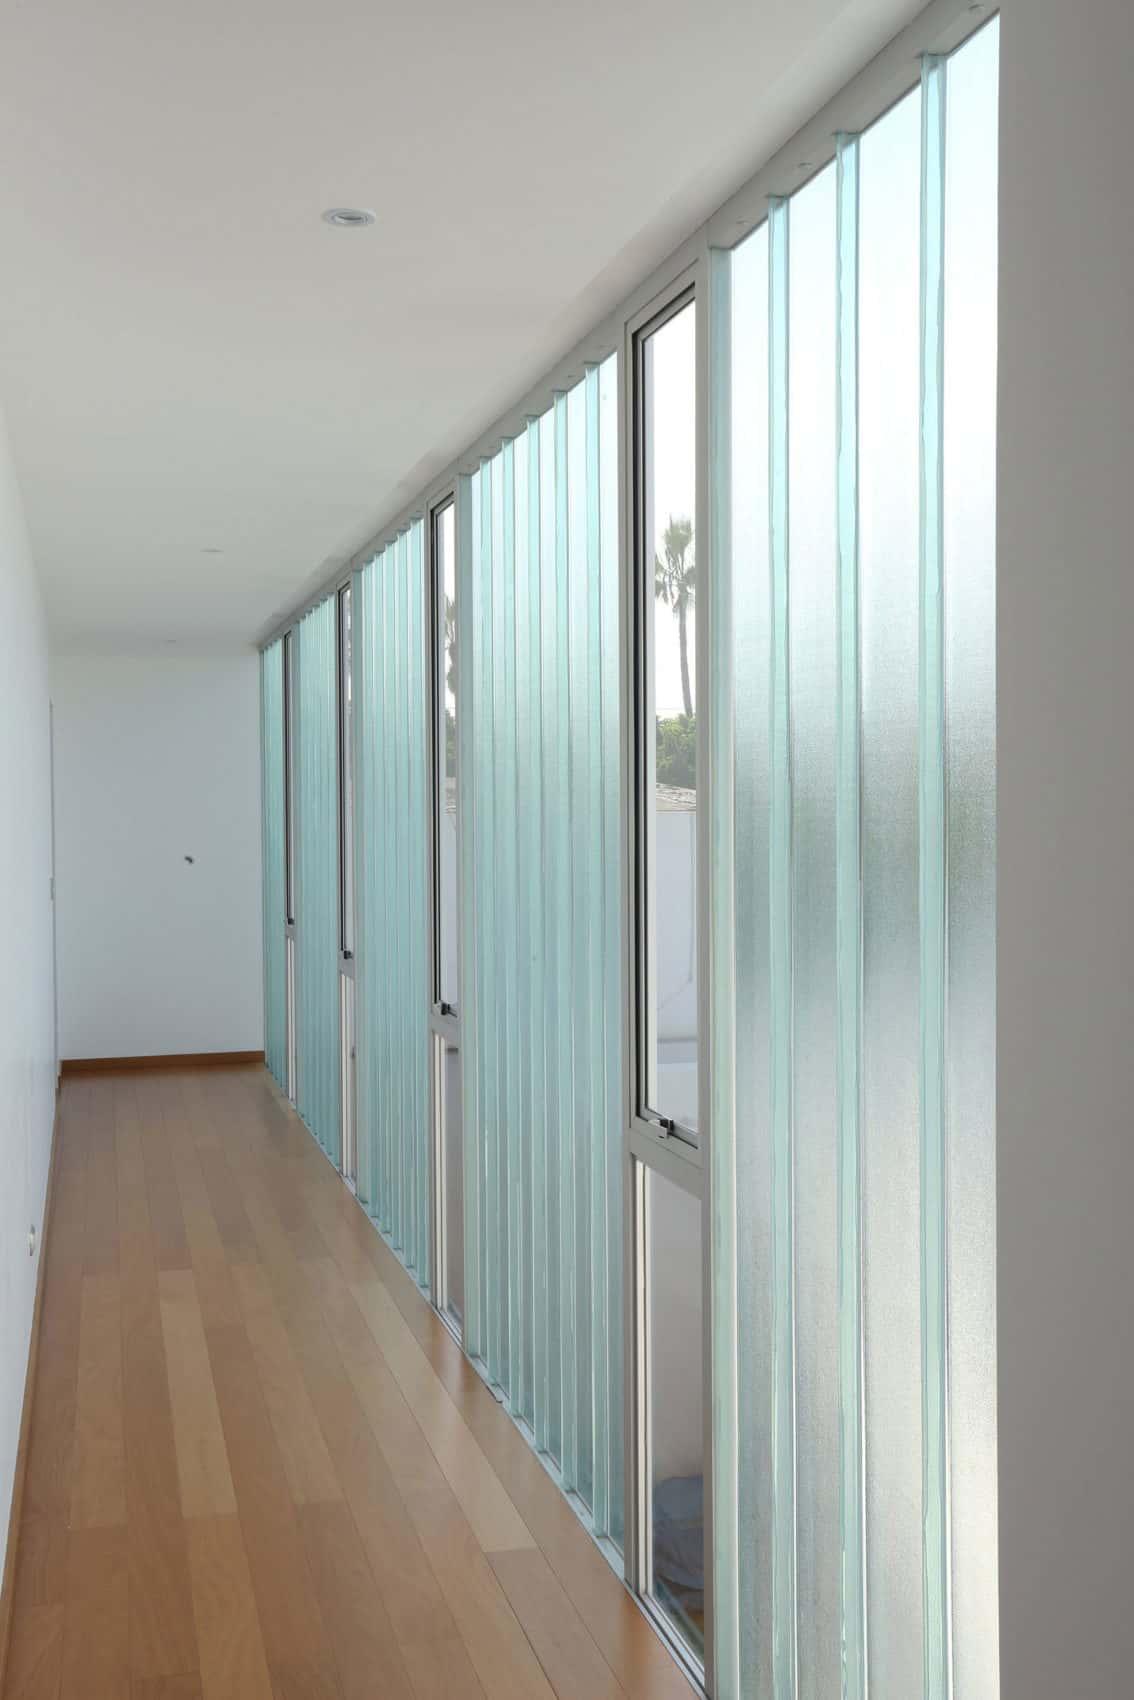 Casa Patios by Riofrio+Rodrigo Arquitectos (10)